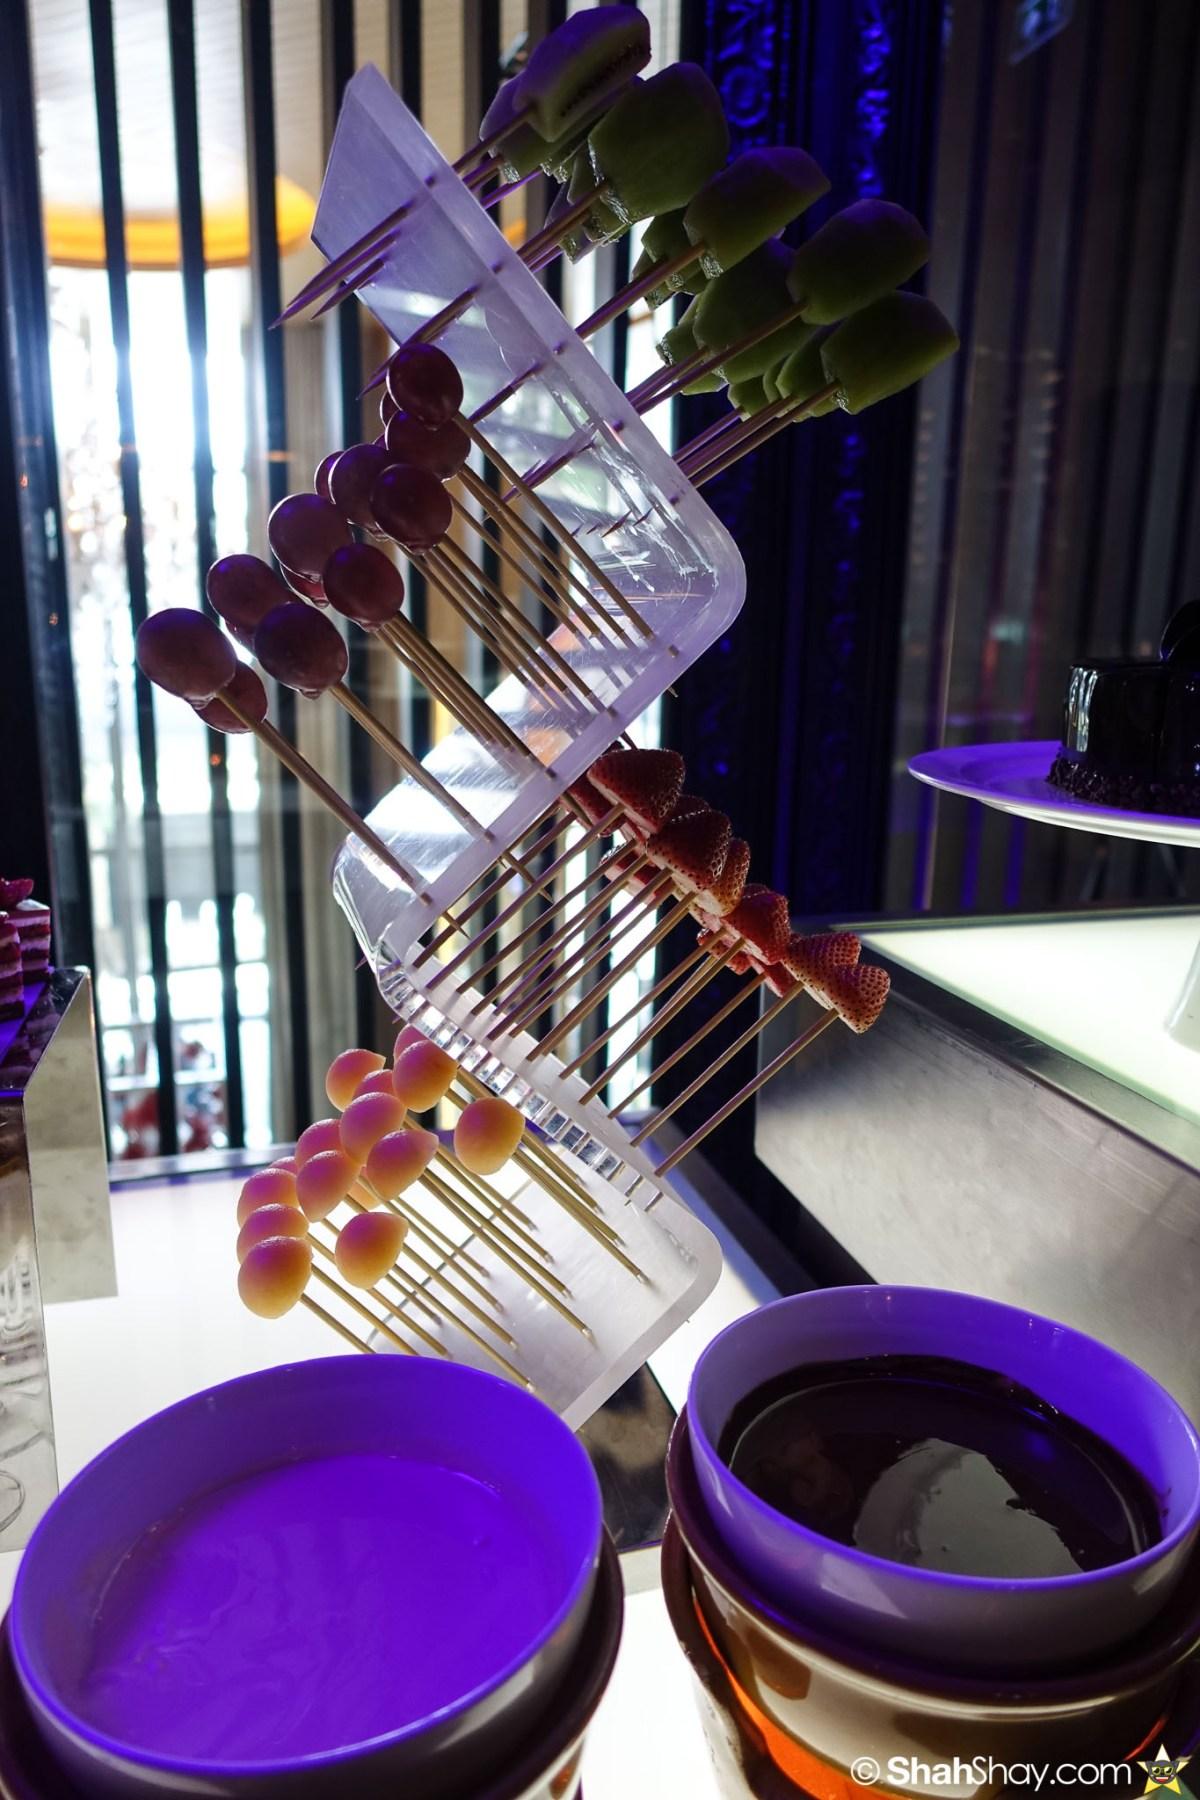 Sunday Brunch Bangkok - Fabulous Brunch Buffet Spread at The District - Chocolate dip